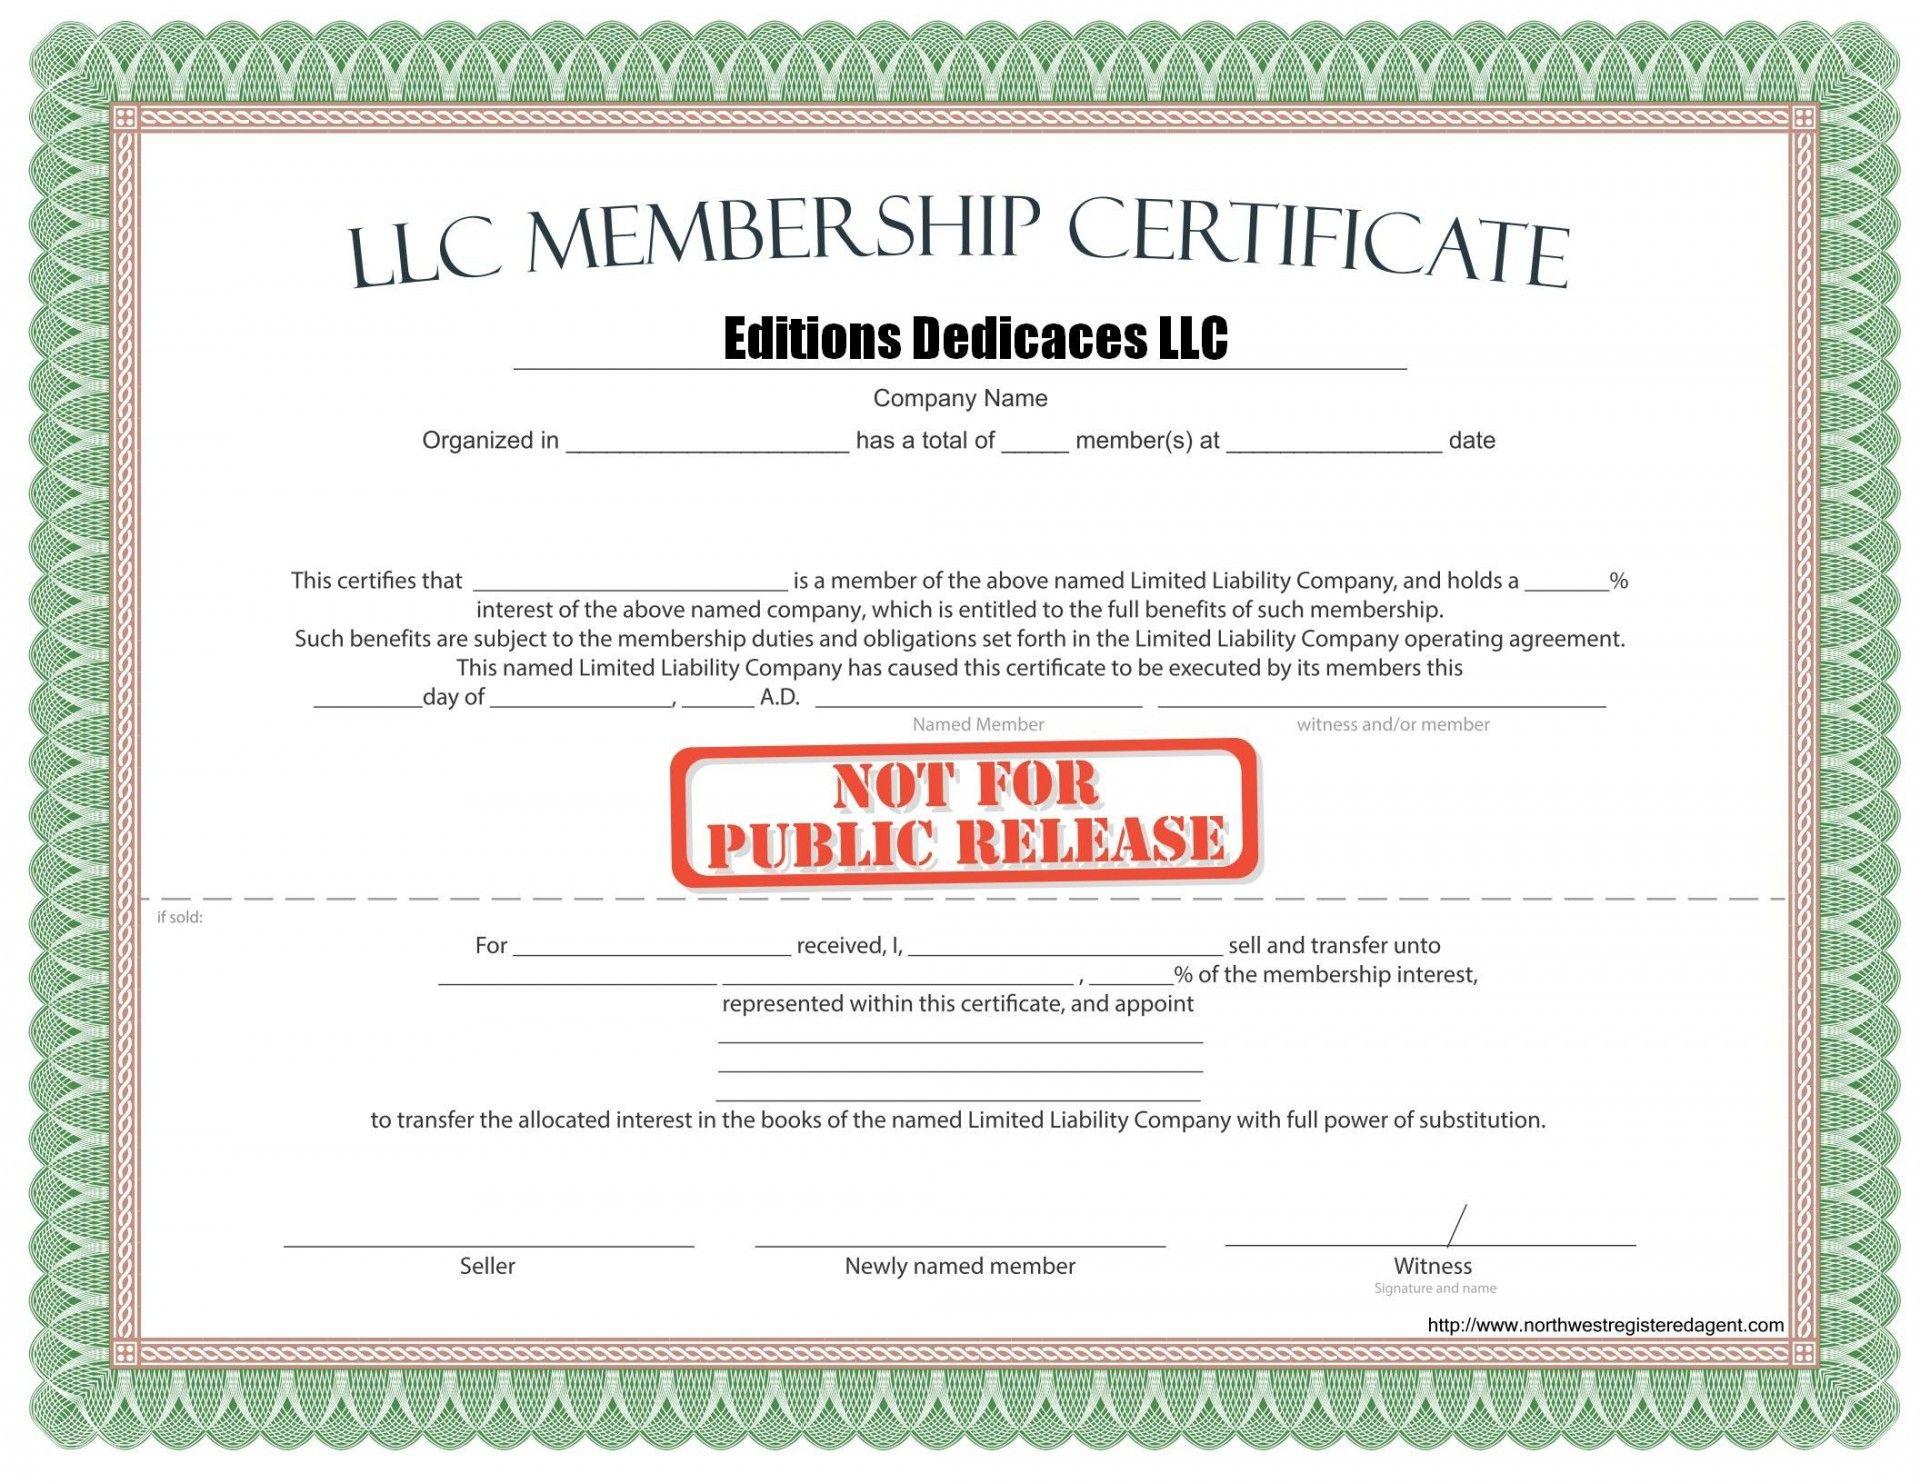 Llc Membership Certificate Template Word Colona Rsd7 With Llc Membership Certificate Tem In 2021 Certificate Templates Certificates Online Birth Certificate Template